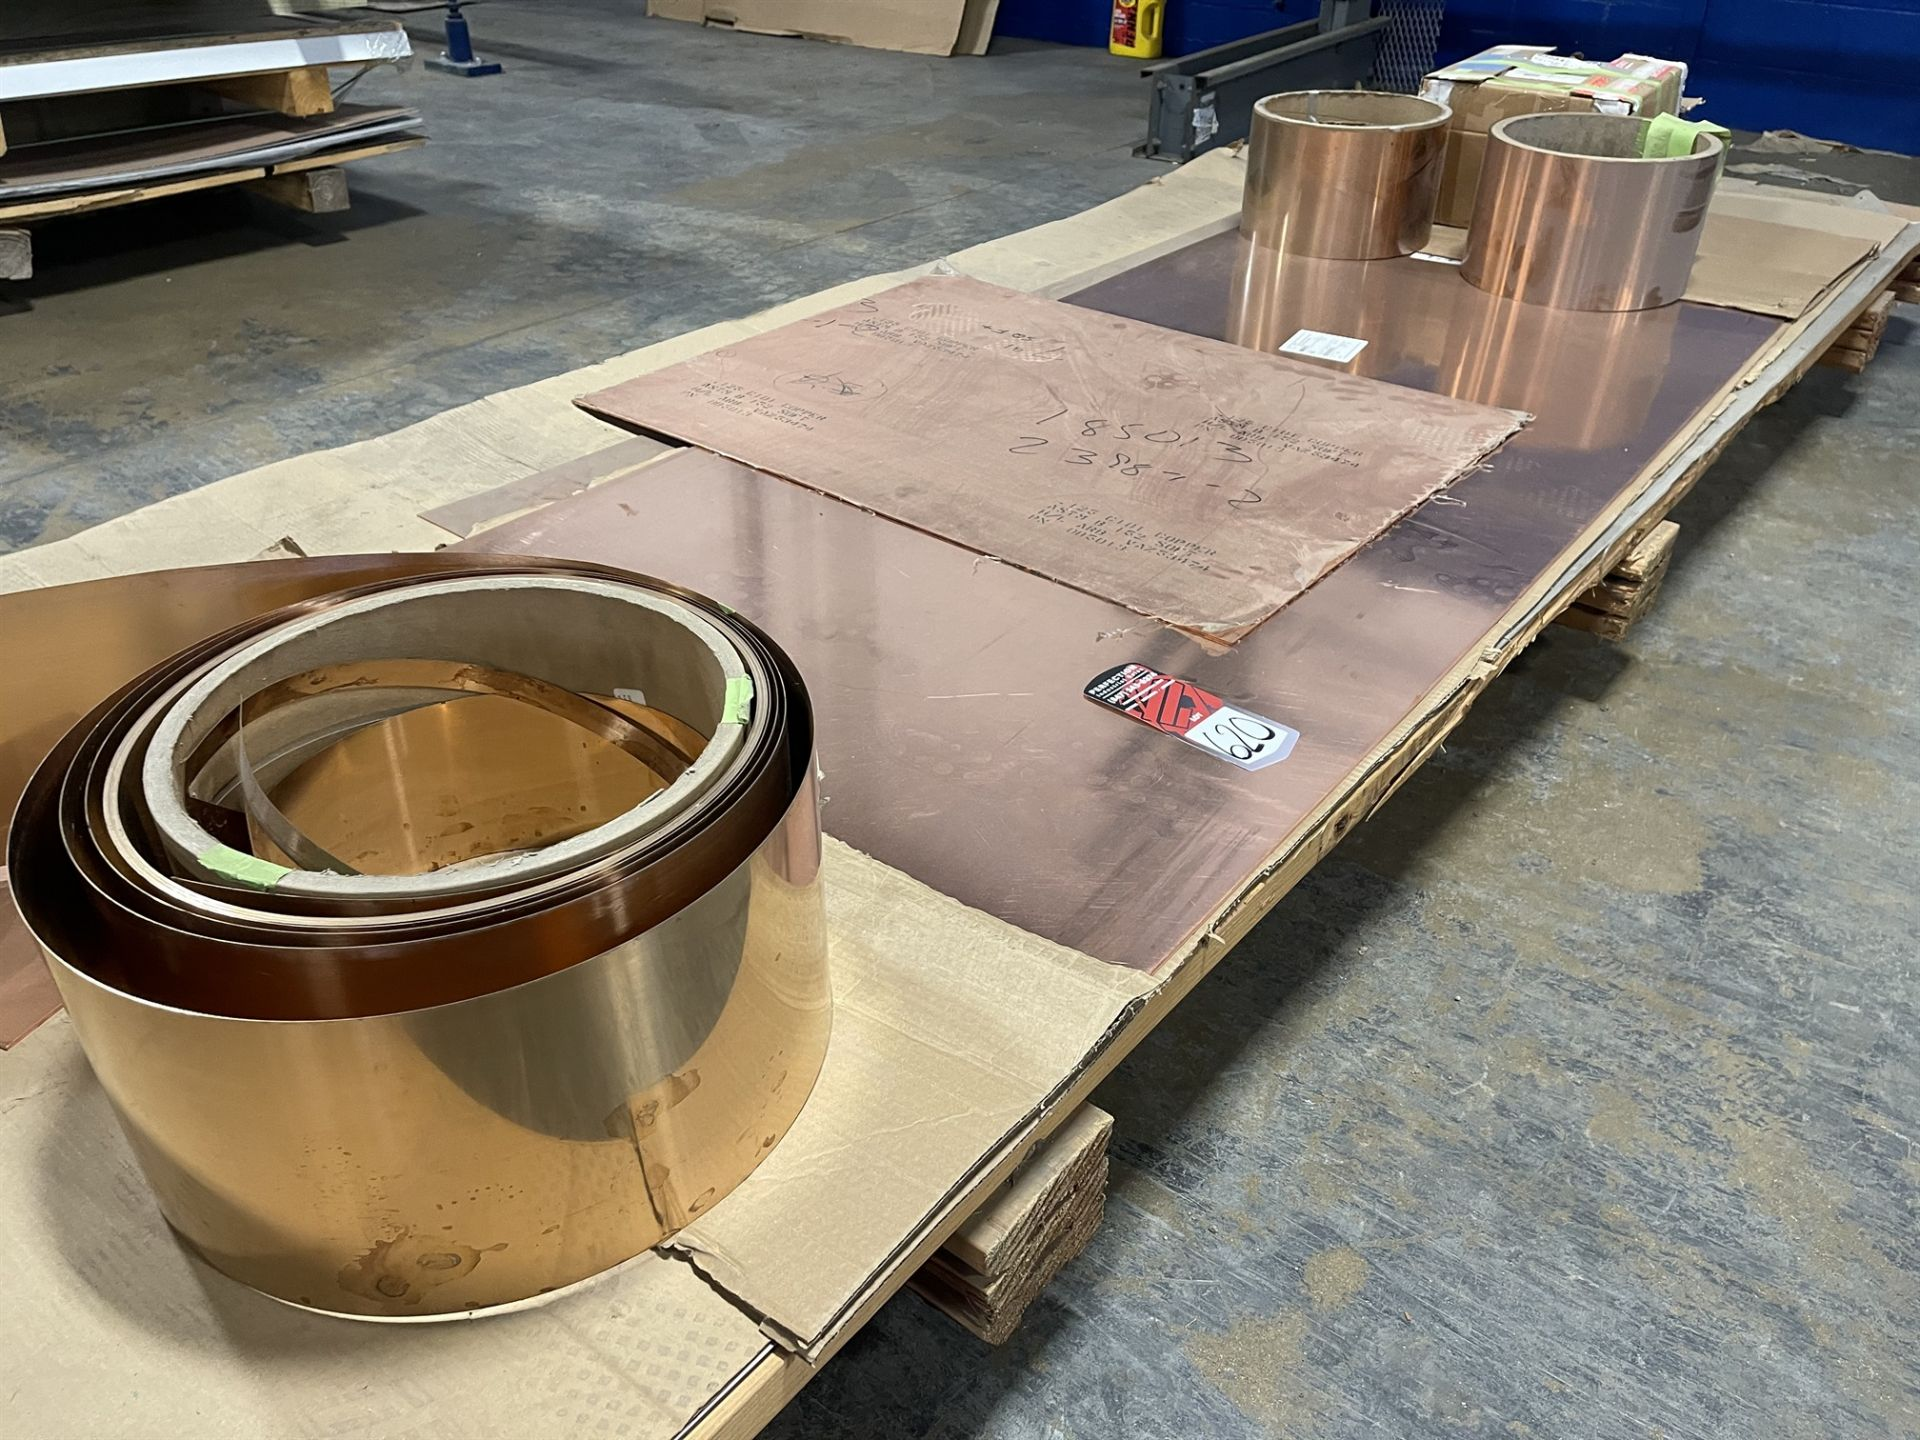 Lot Comprising Assorted Soft Copper Sheet and Copper-Beryllium Strip